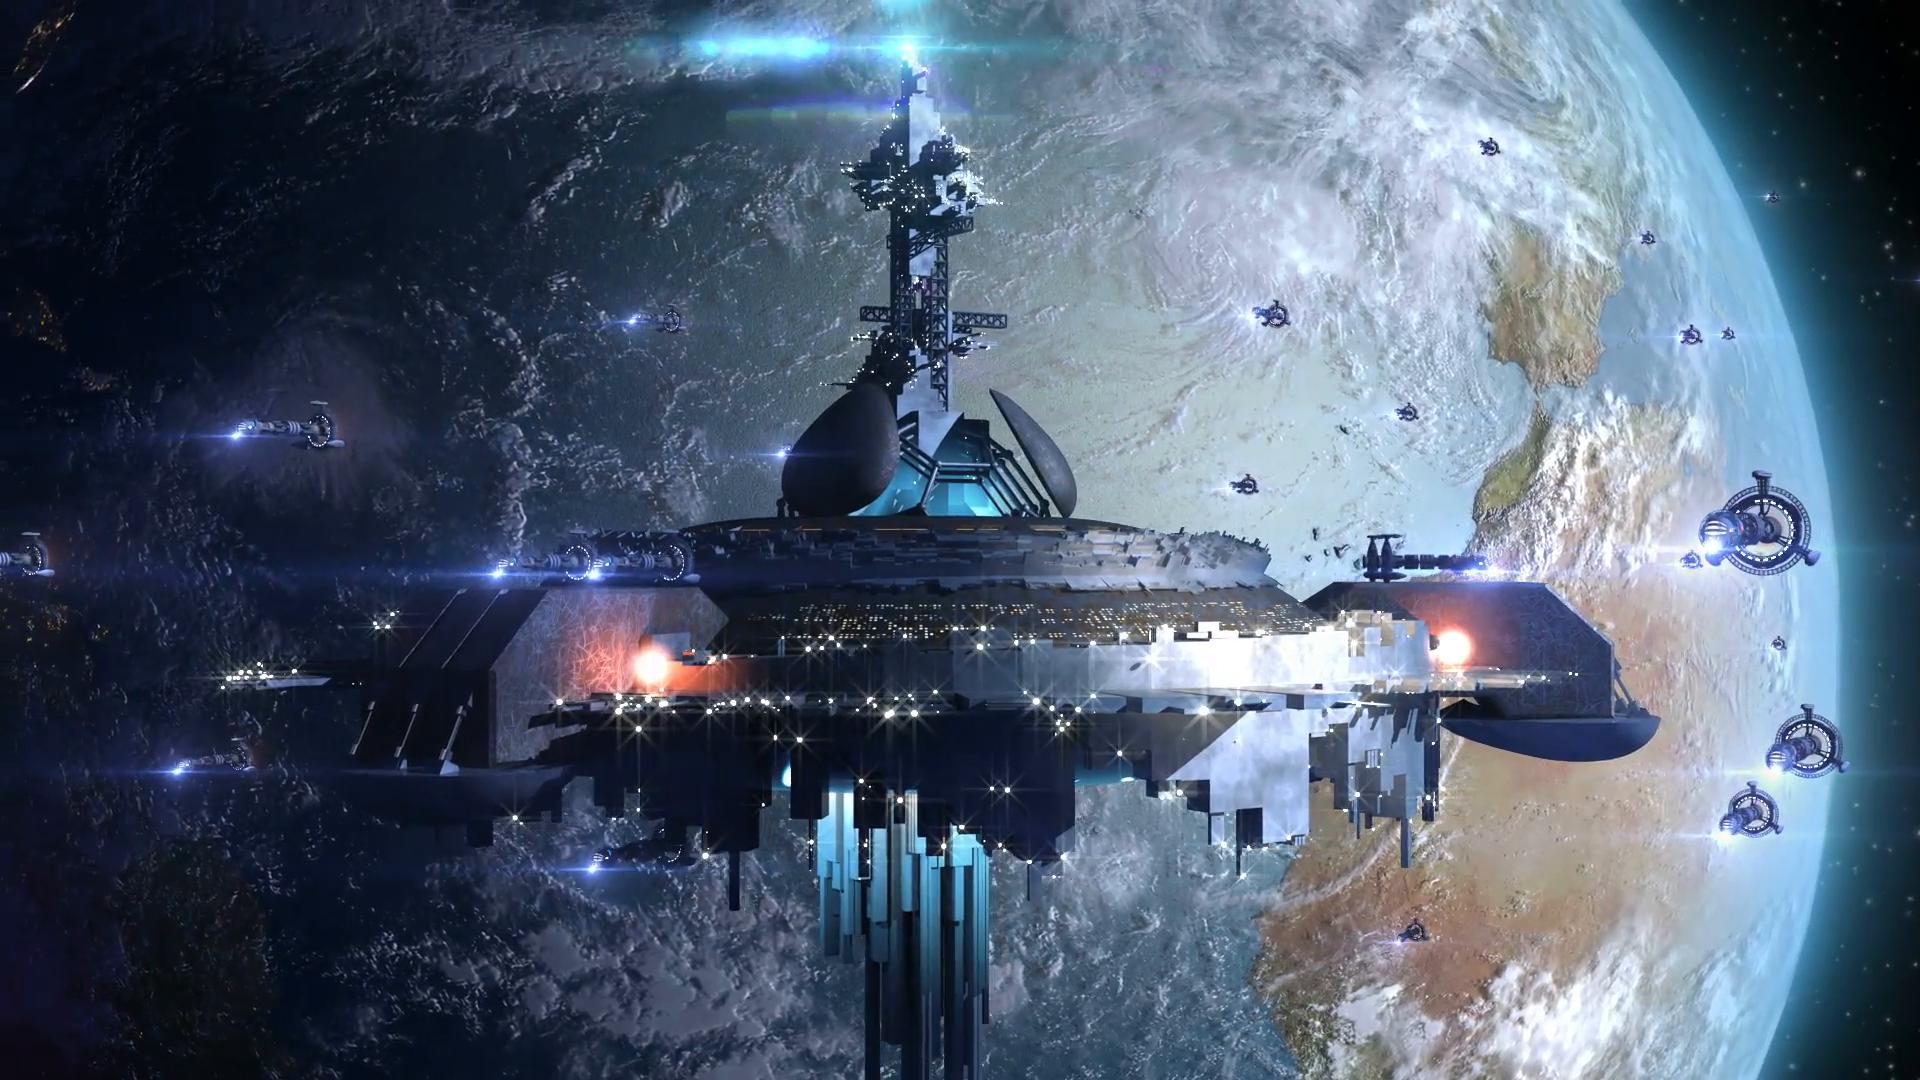 Alien space station hd wallpaper background image - Space station wallpaper ...